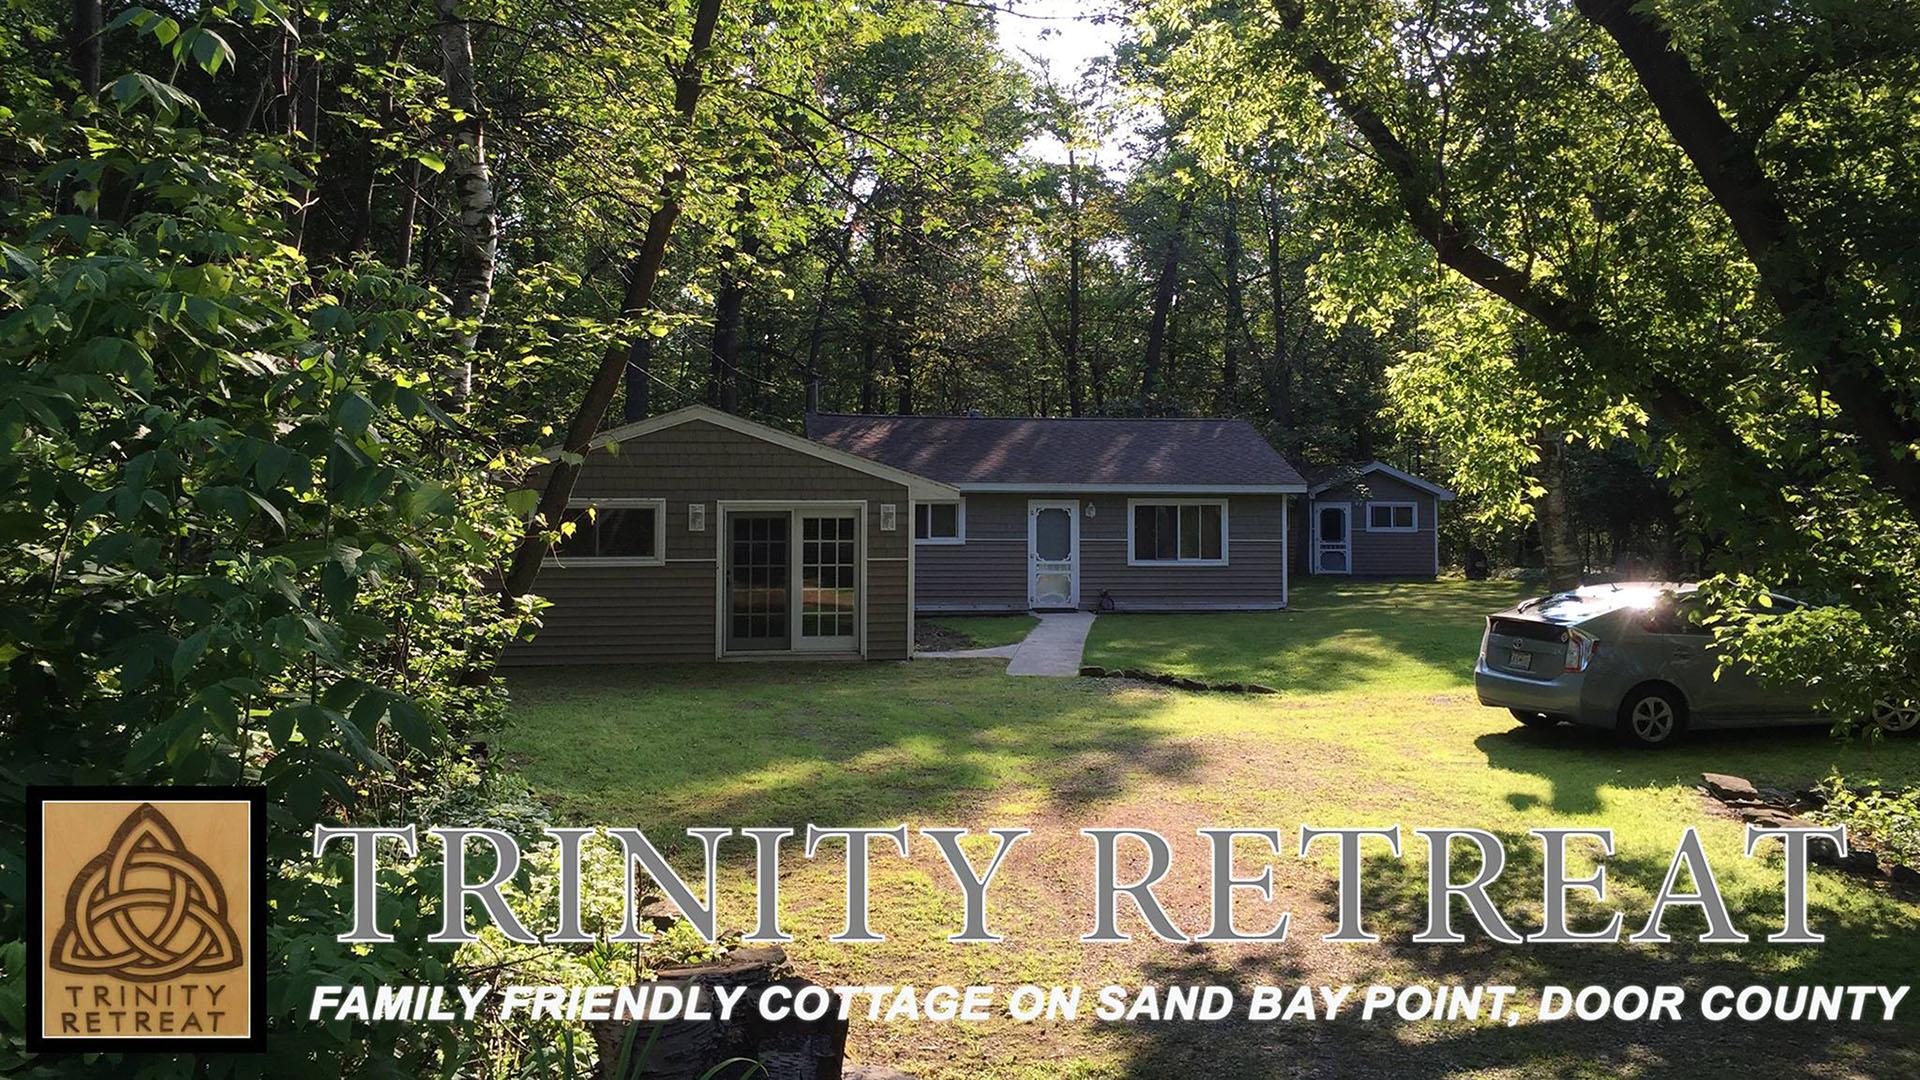 Trinity Retreat